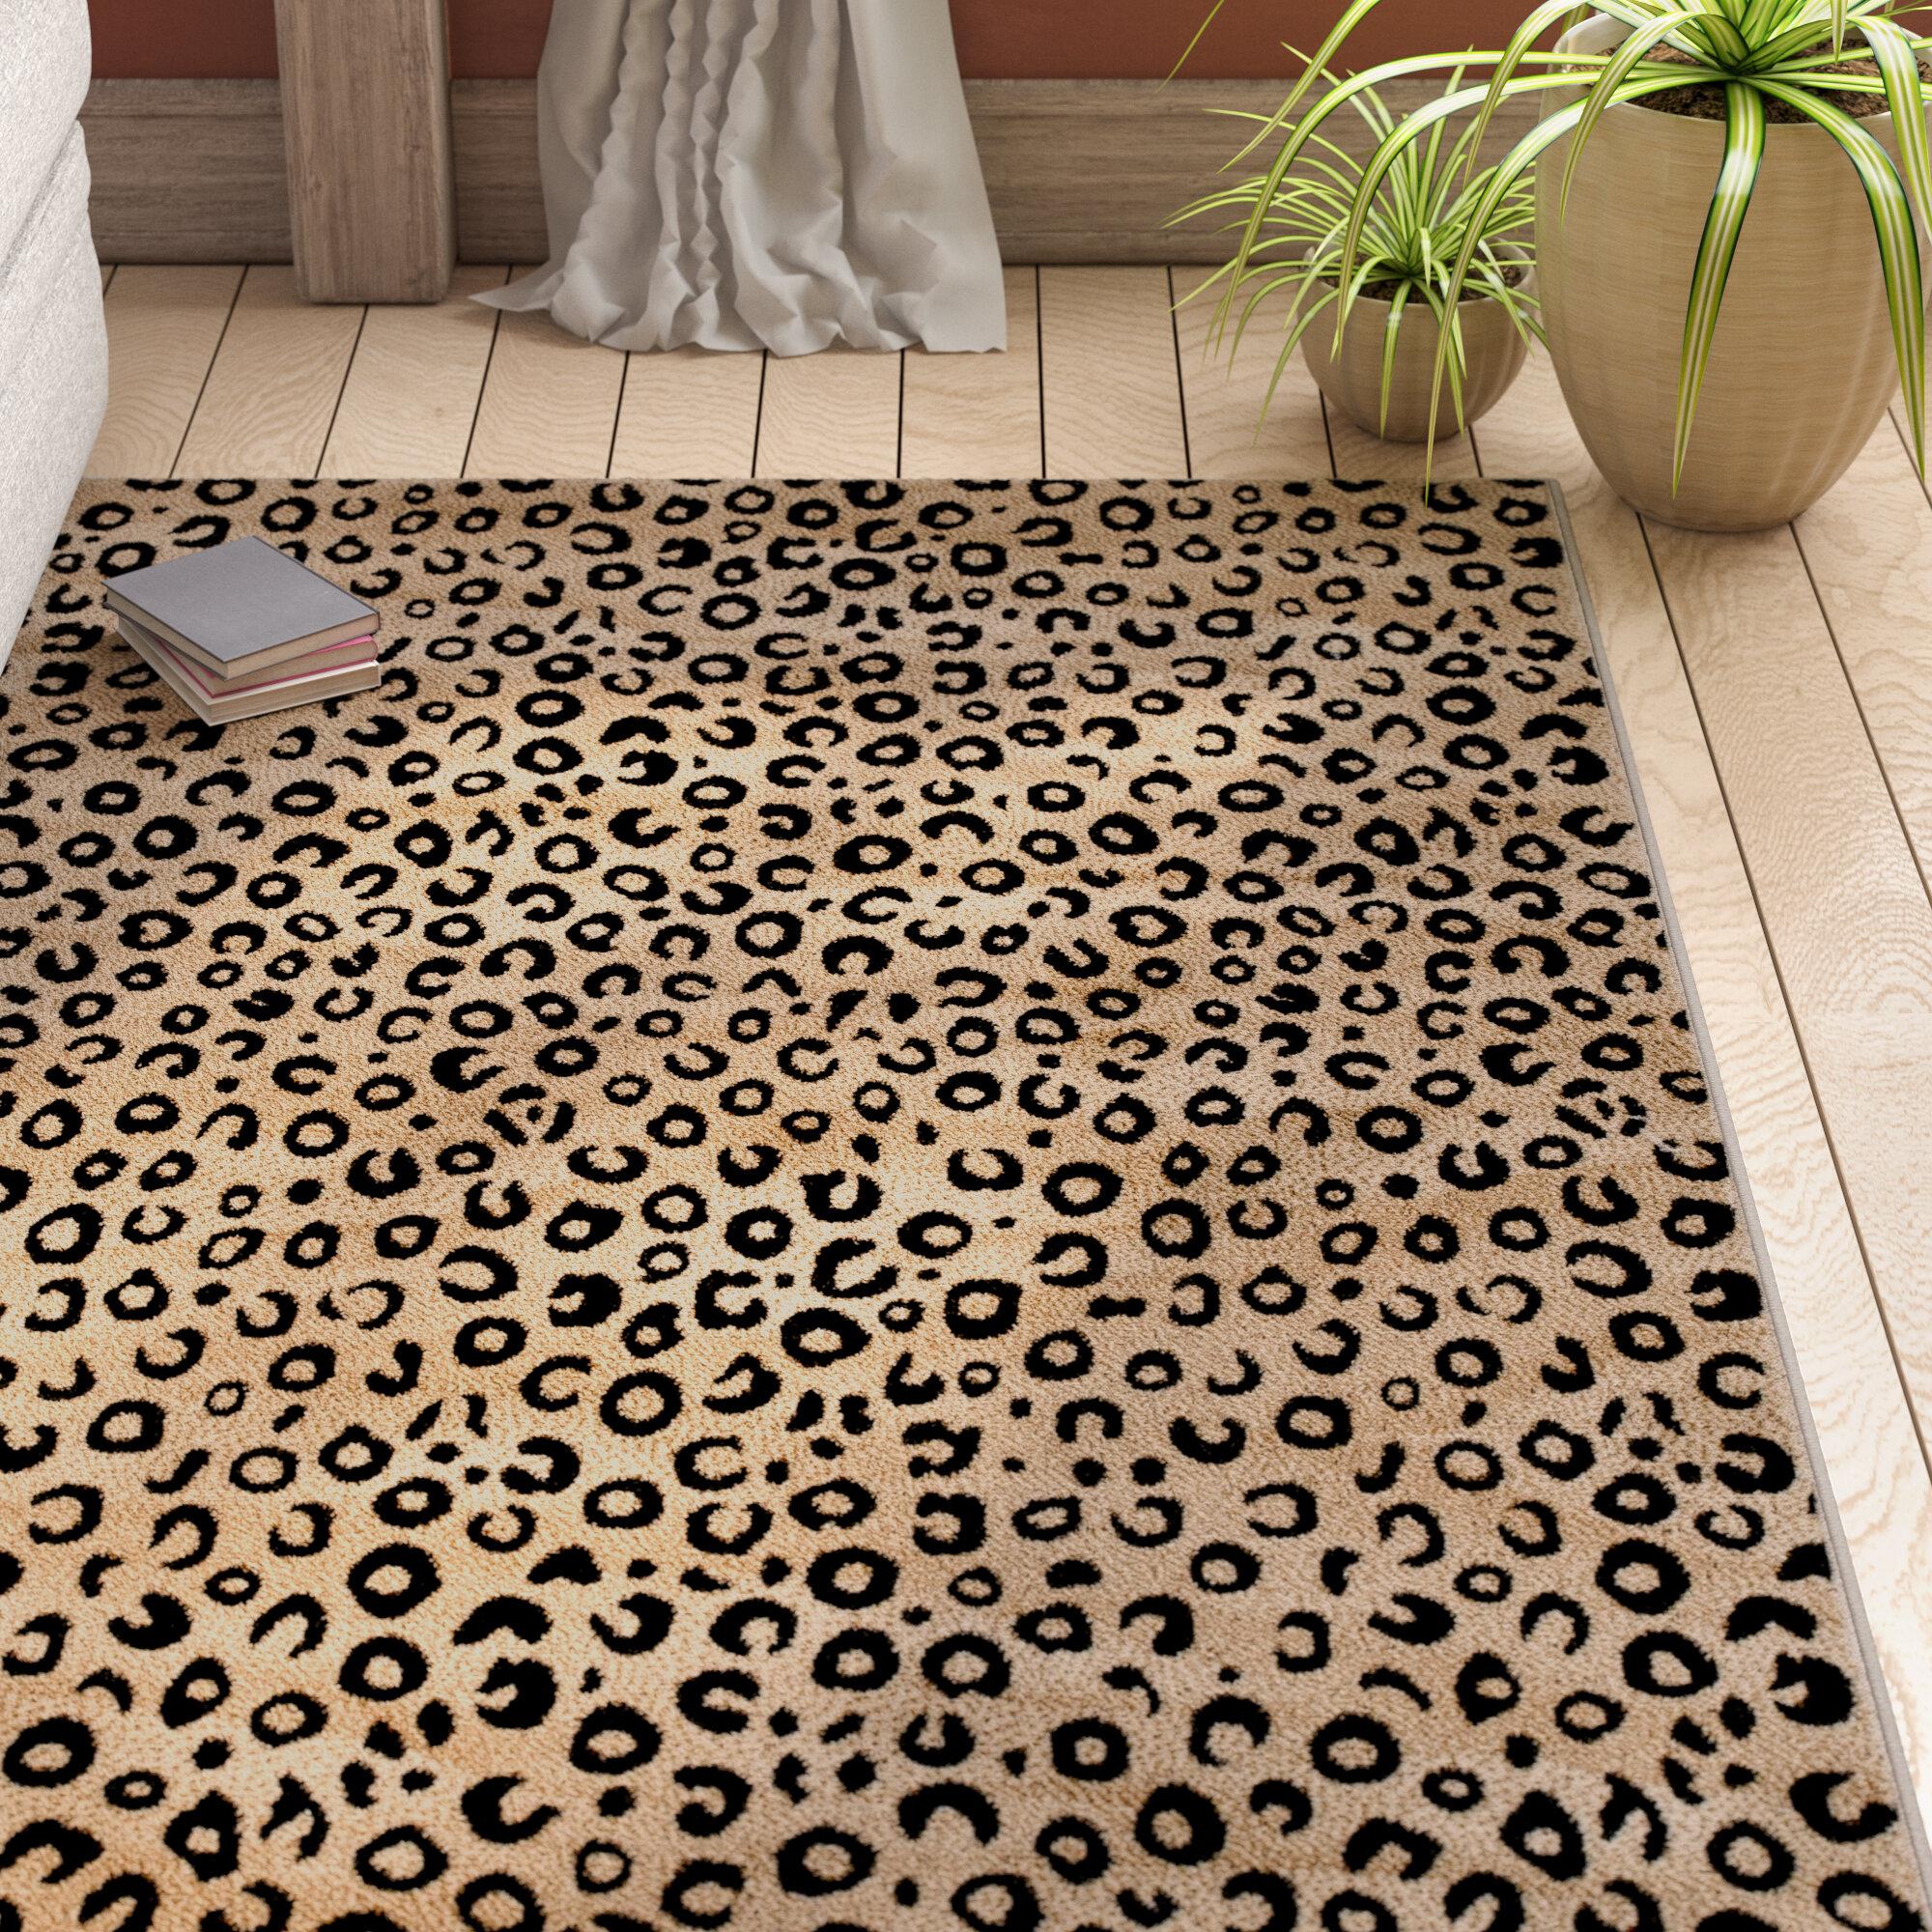 Poteat Animal Print Black Area Rug